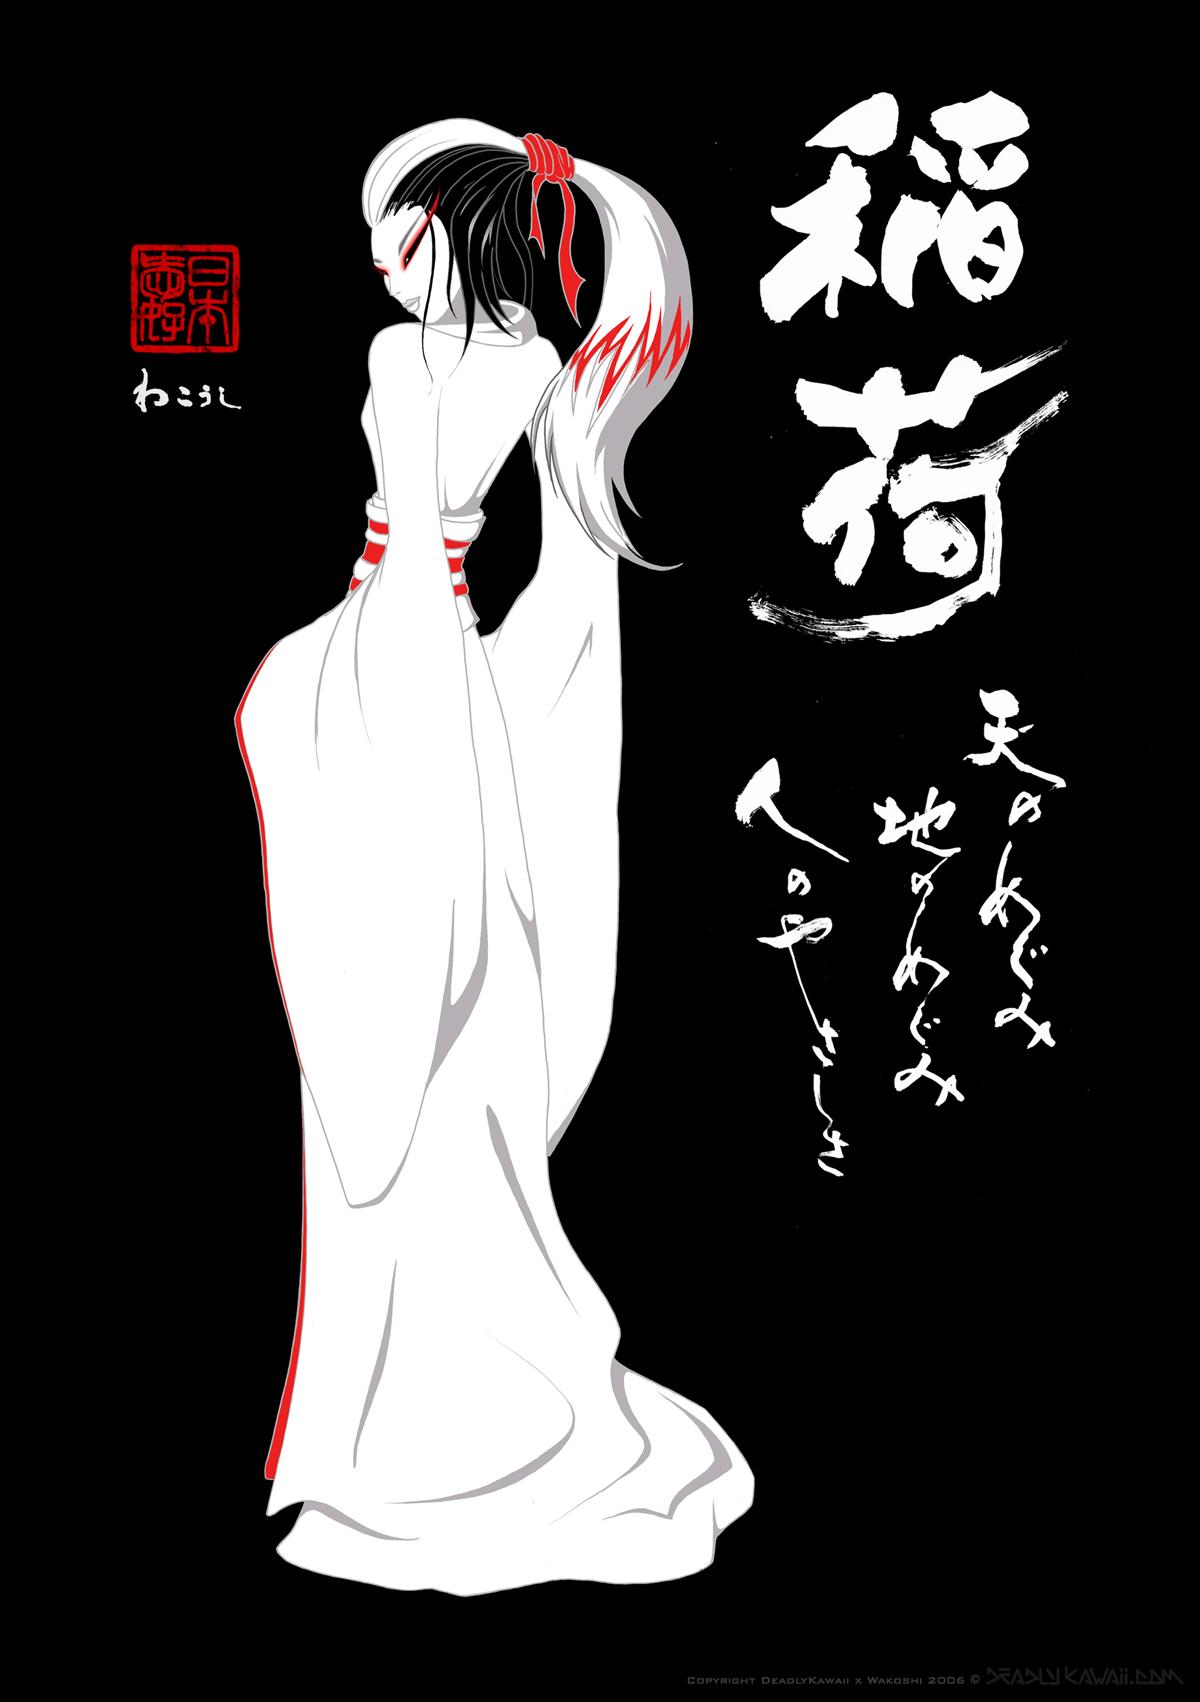 kitsune-Inari-by-DeadlyKawaii-x-Wakoshi.png